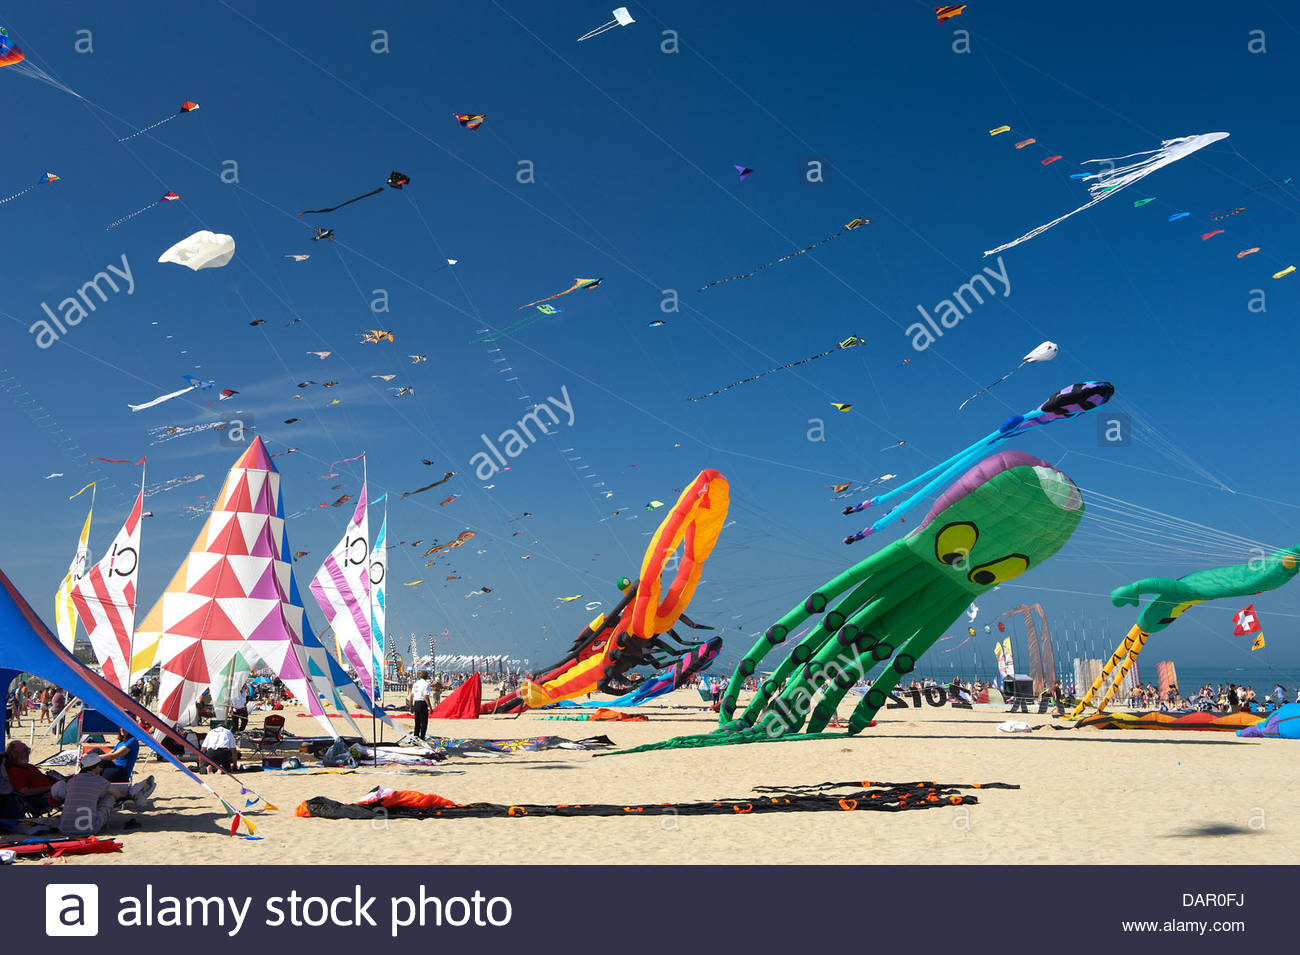 International Kite Festival,Cervia,Emilia Romagna,Italy - Stock Image